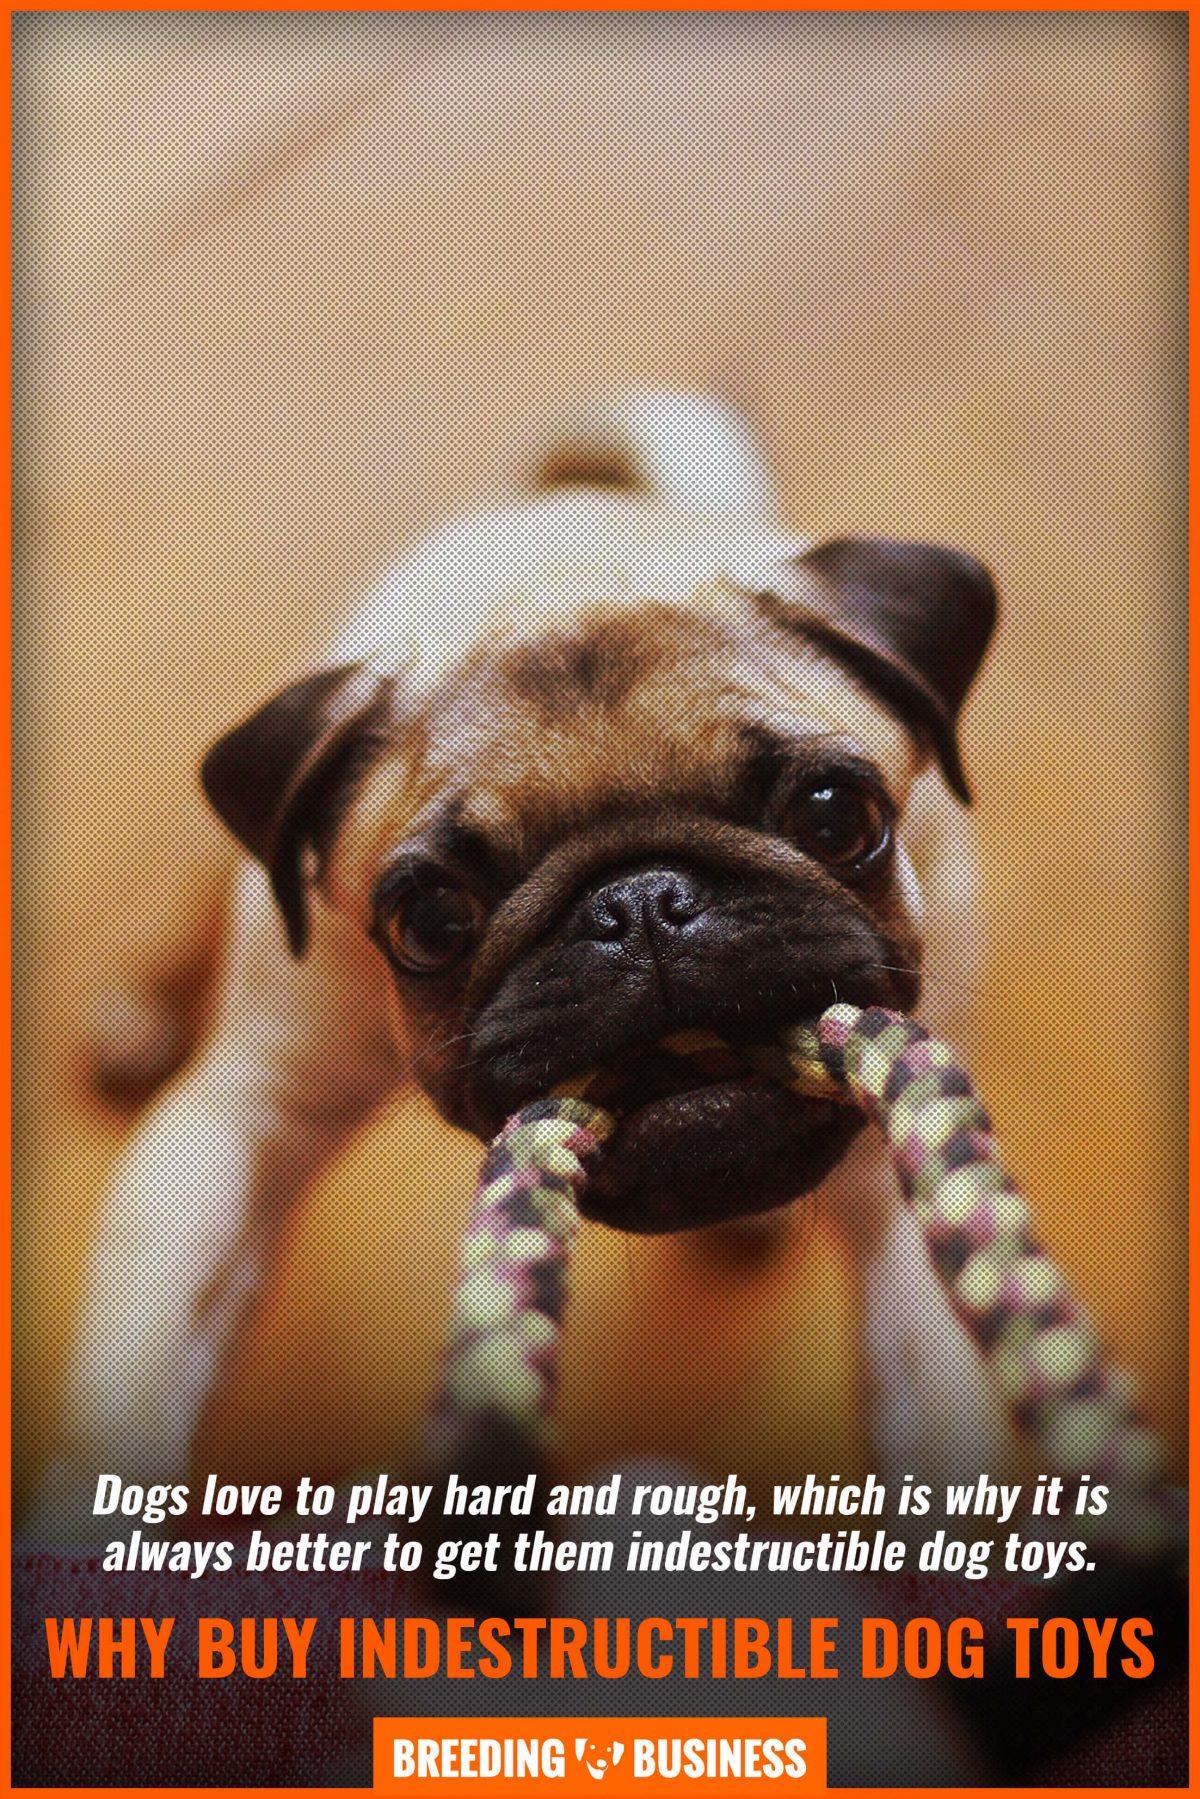 why buy indestructible dog toys